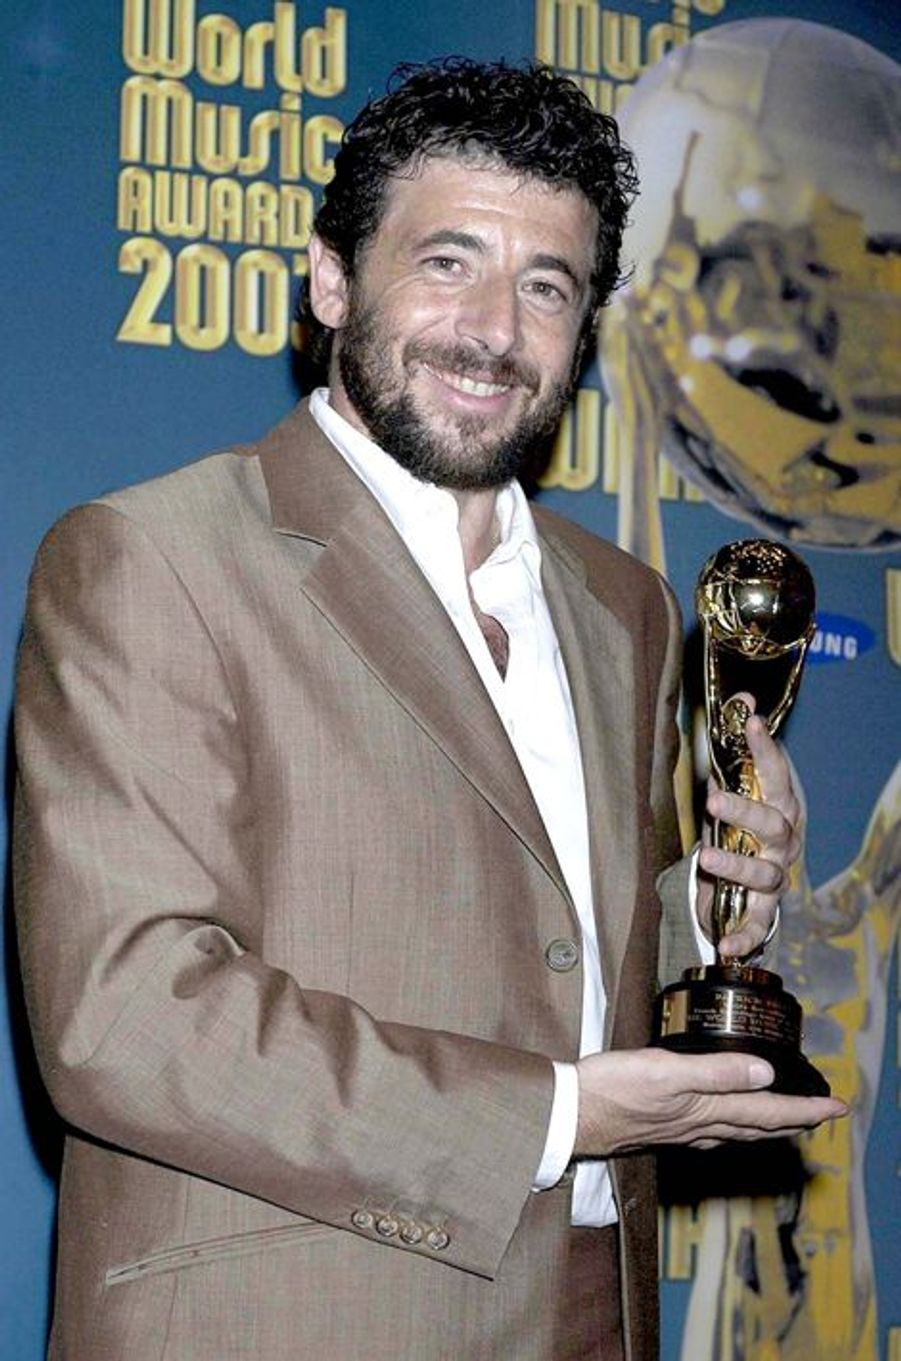 Patrick Bruel à Monte Carlo le 12 octobre 2003.